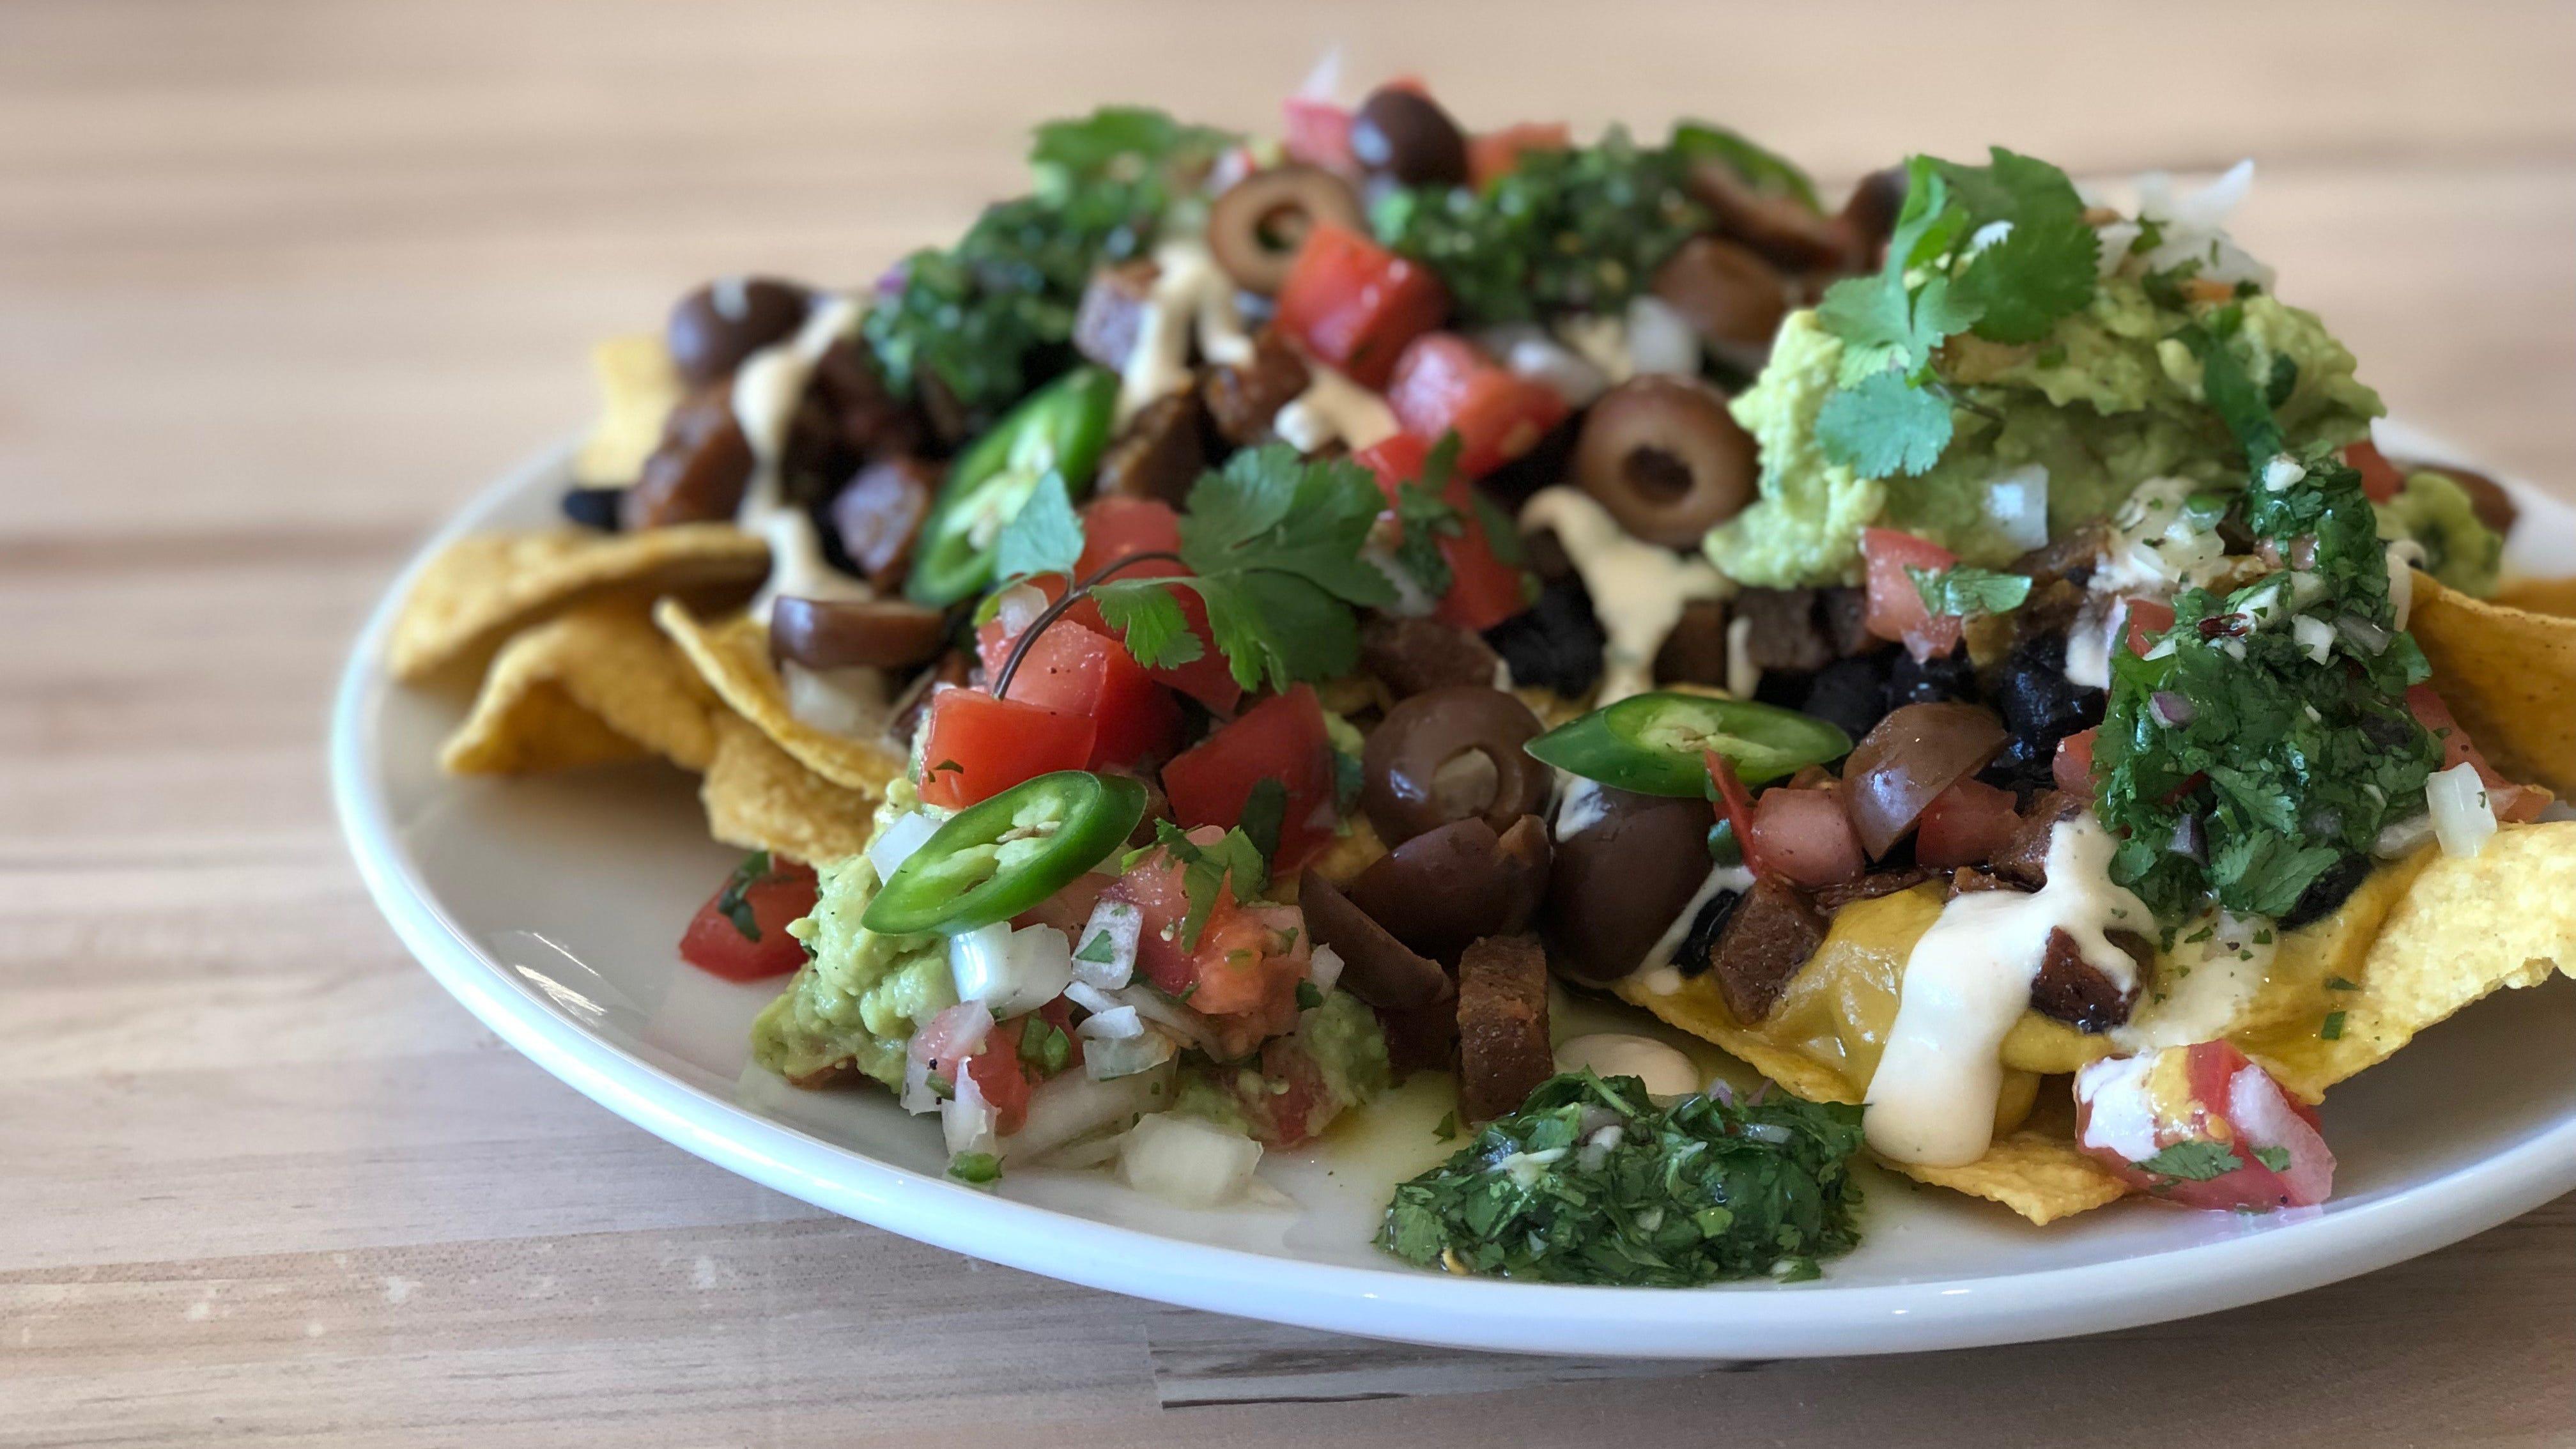 Name Verdura: Verdura Restaurant Brings Vegan-kosher Food To Central Phoenix